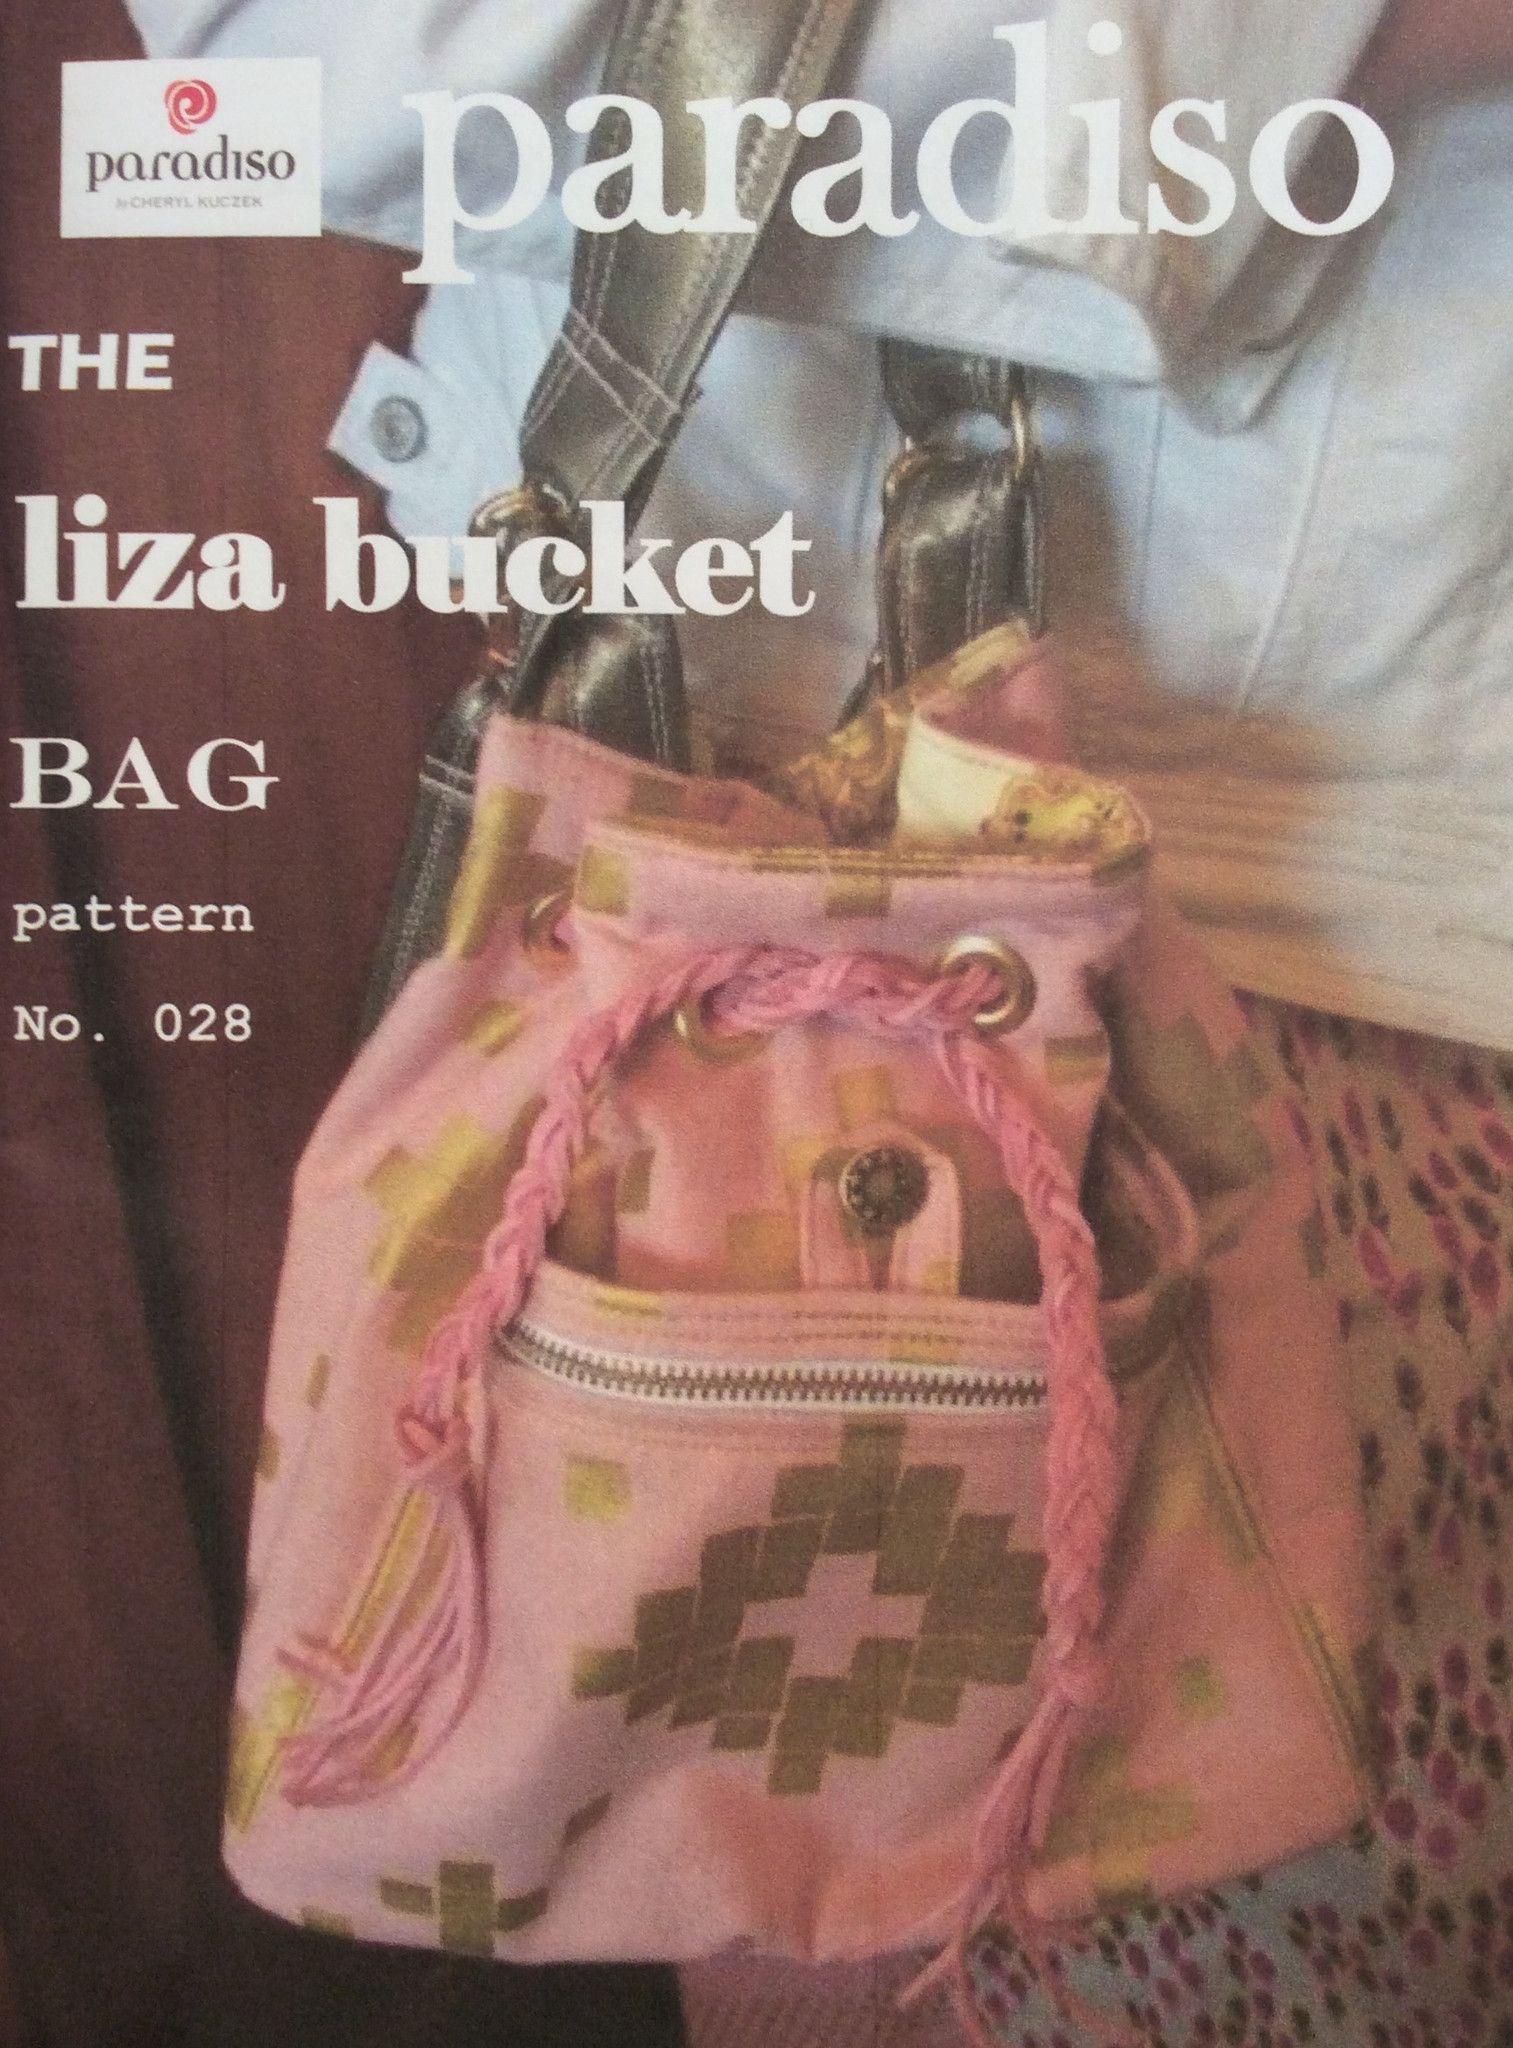 Paradiso Designs - The Liza Bucket Bag | Bag Pattern